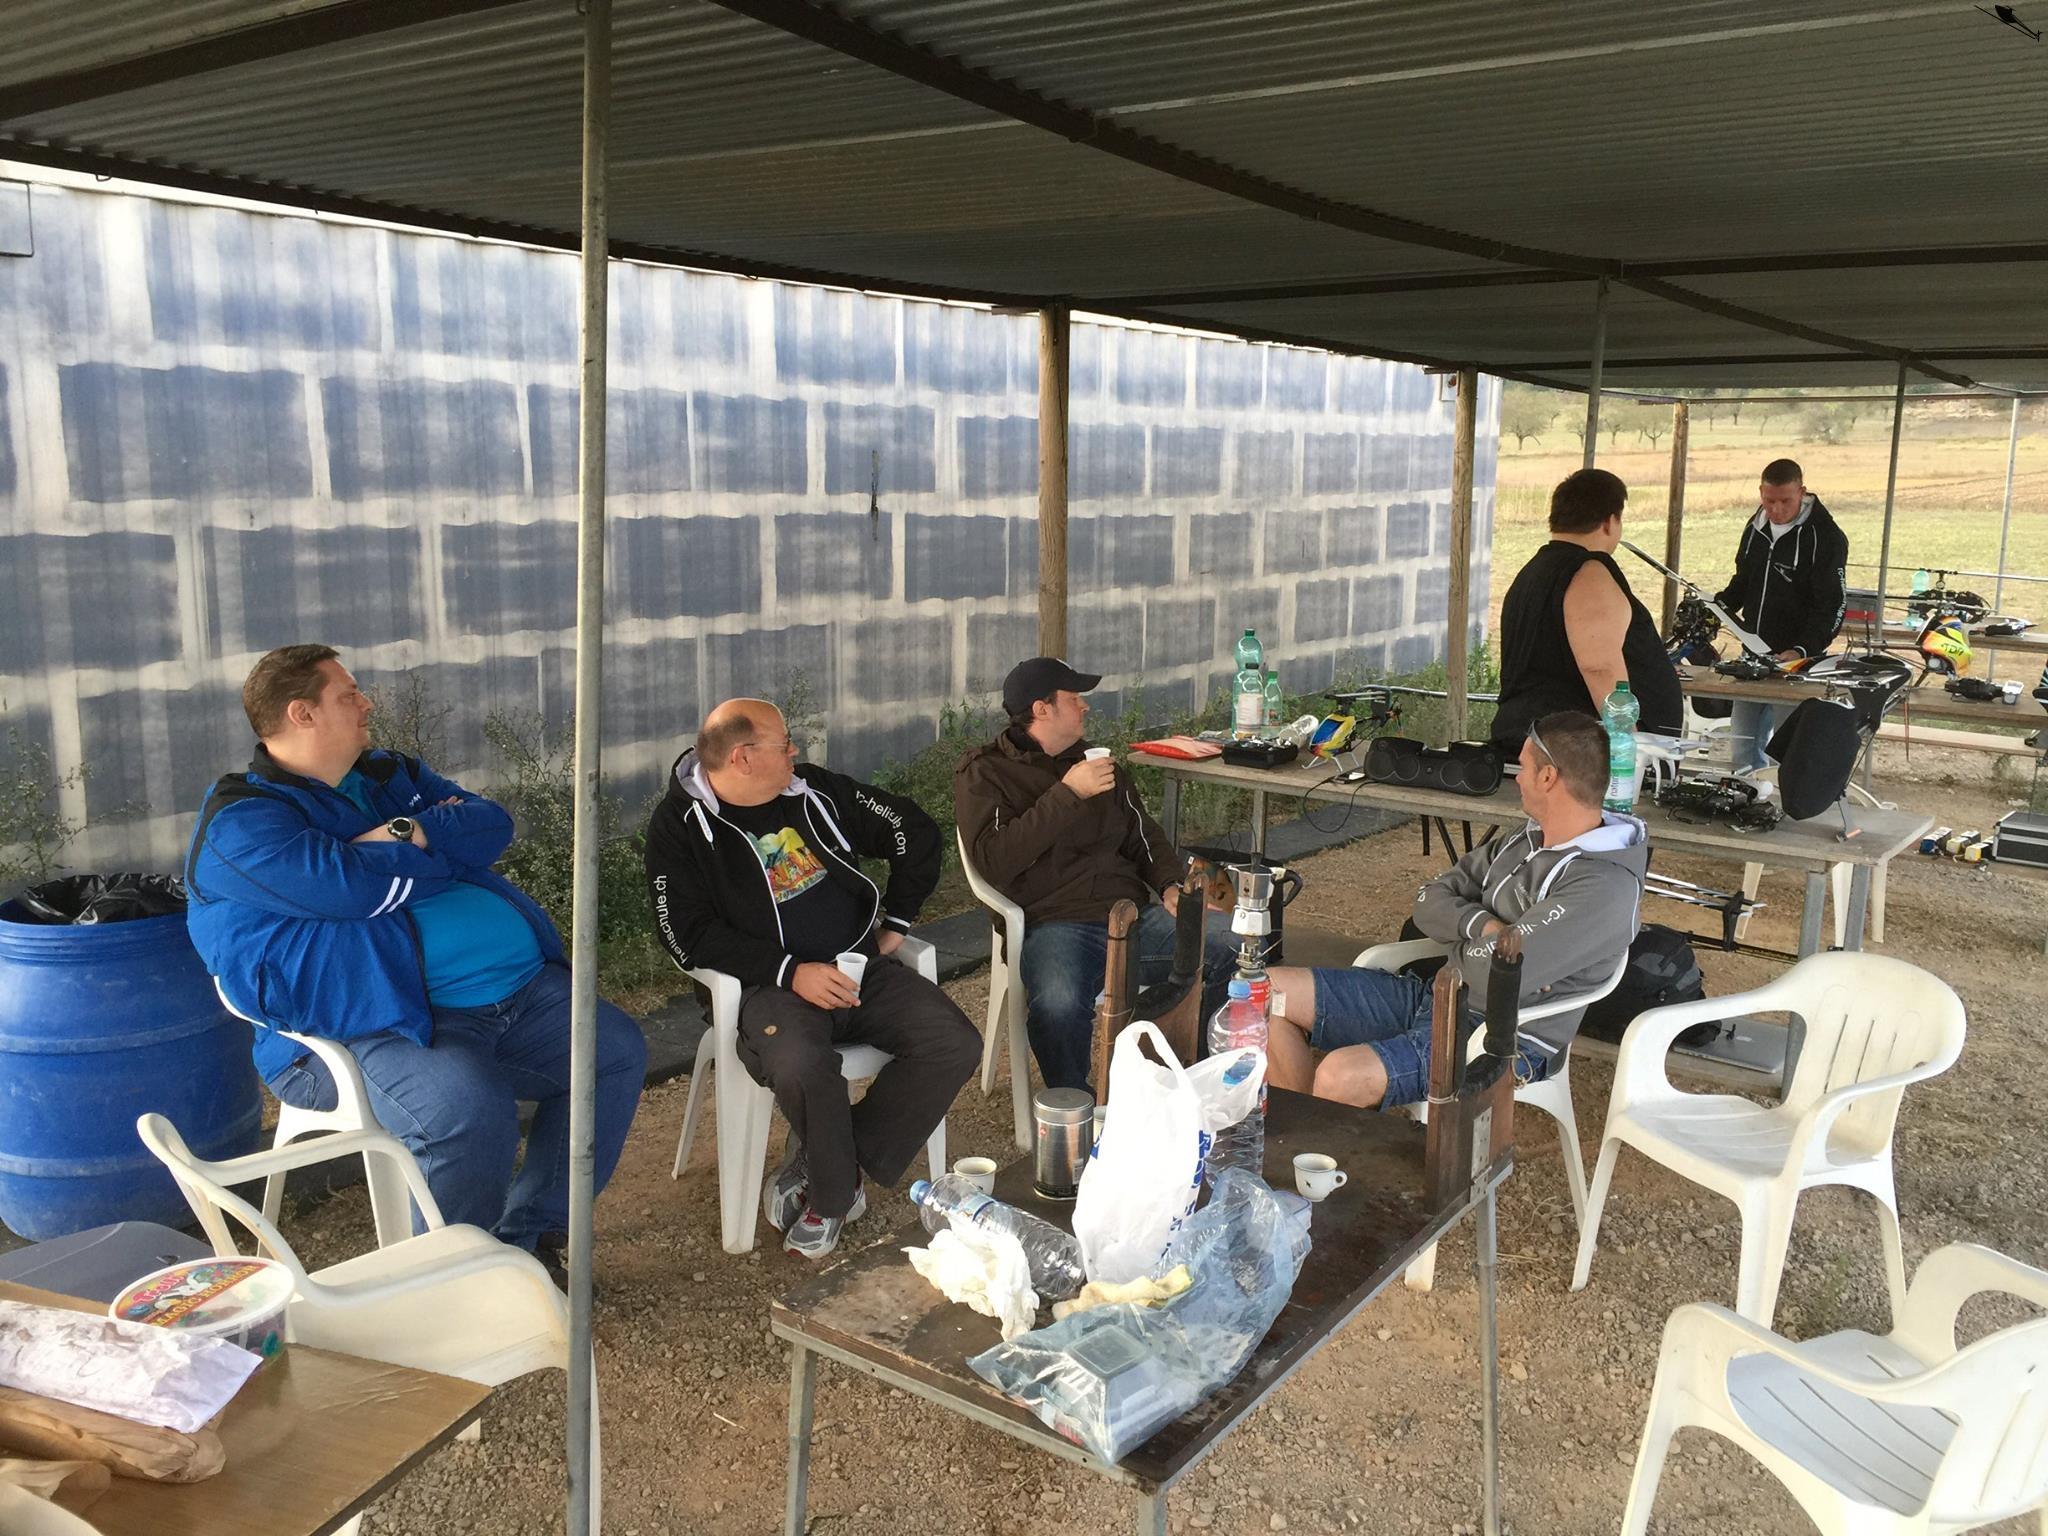 Heli_Camp_Mallorca_RC-Helitours-7